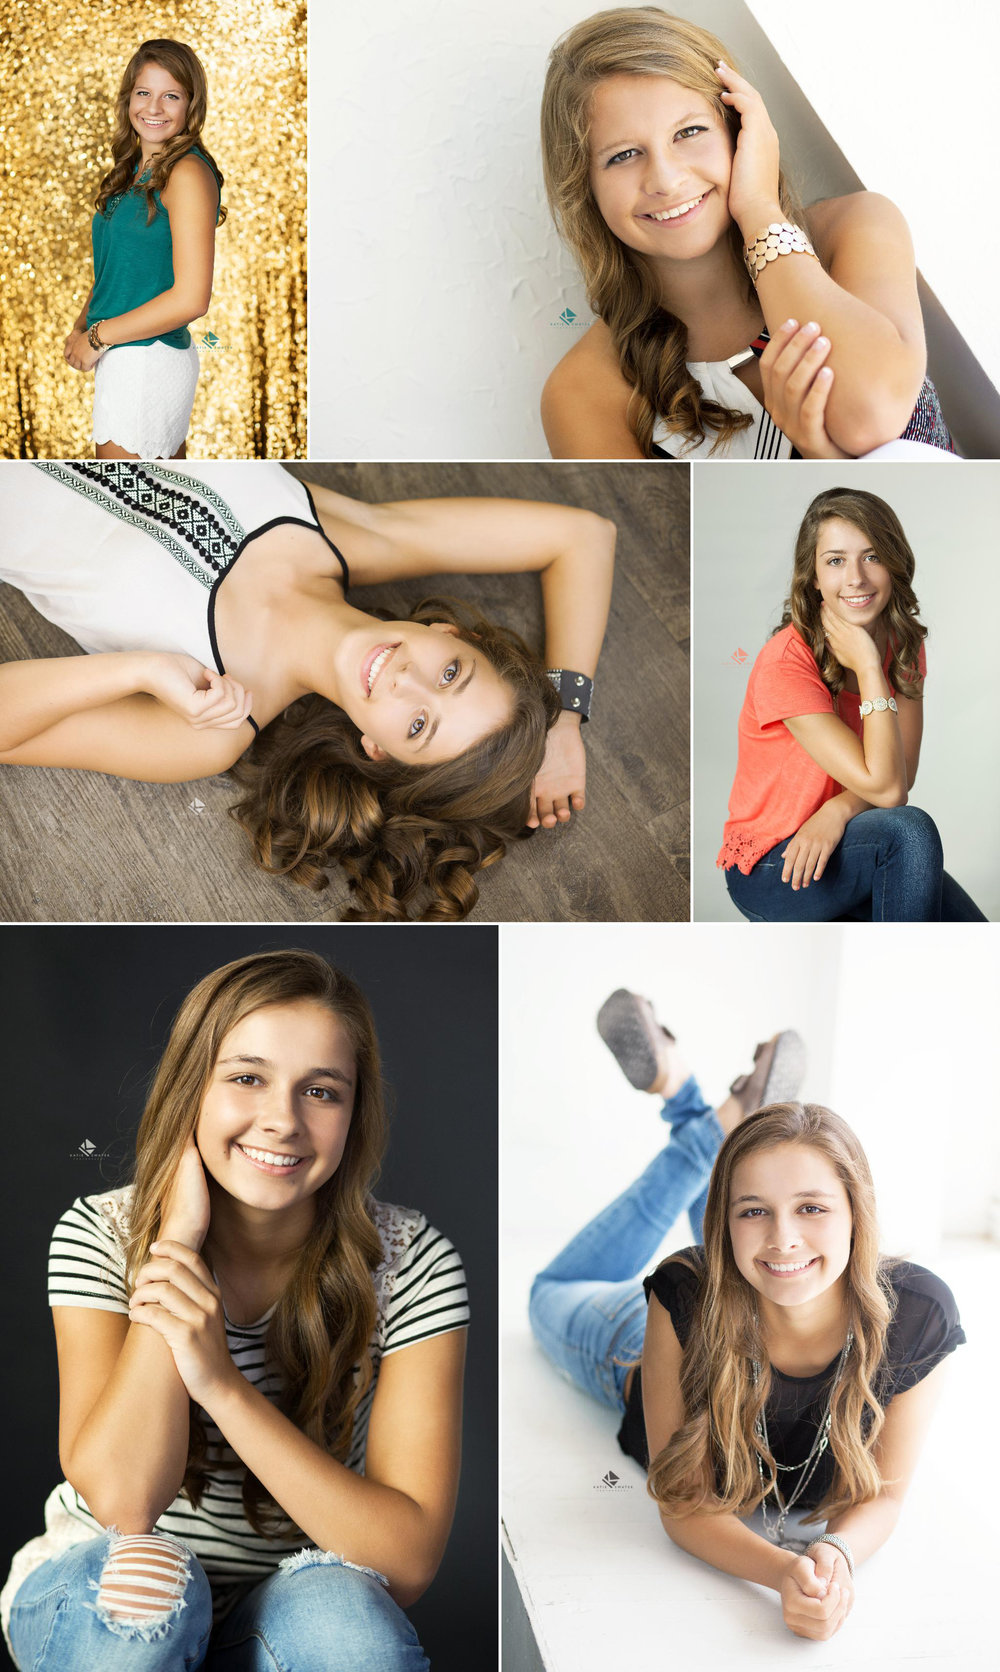 Studio Senior Images by Katie Swatek Photography